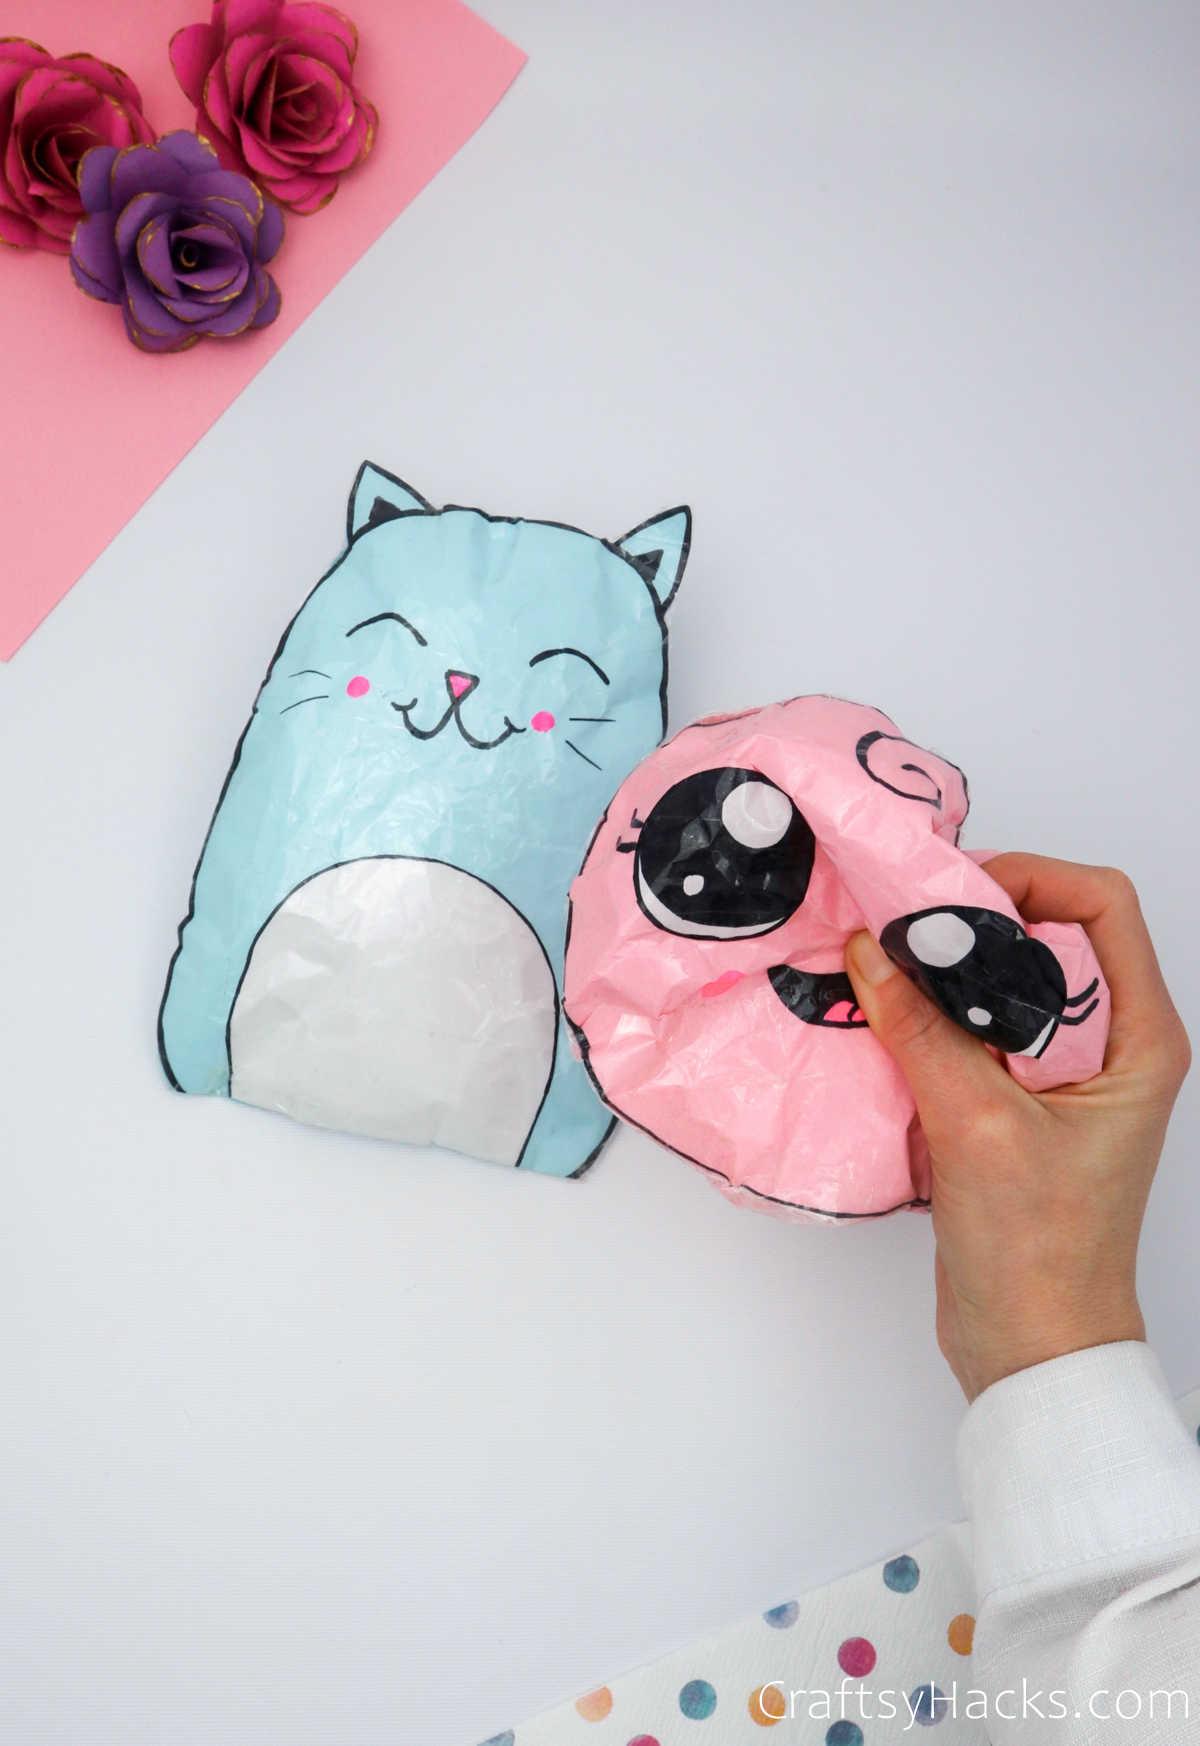 holding pink squishie